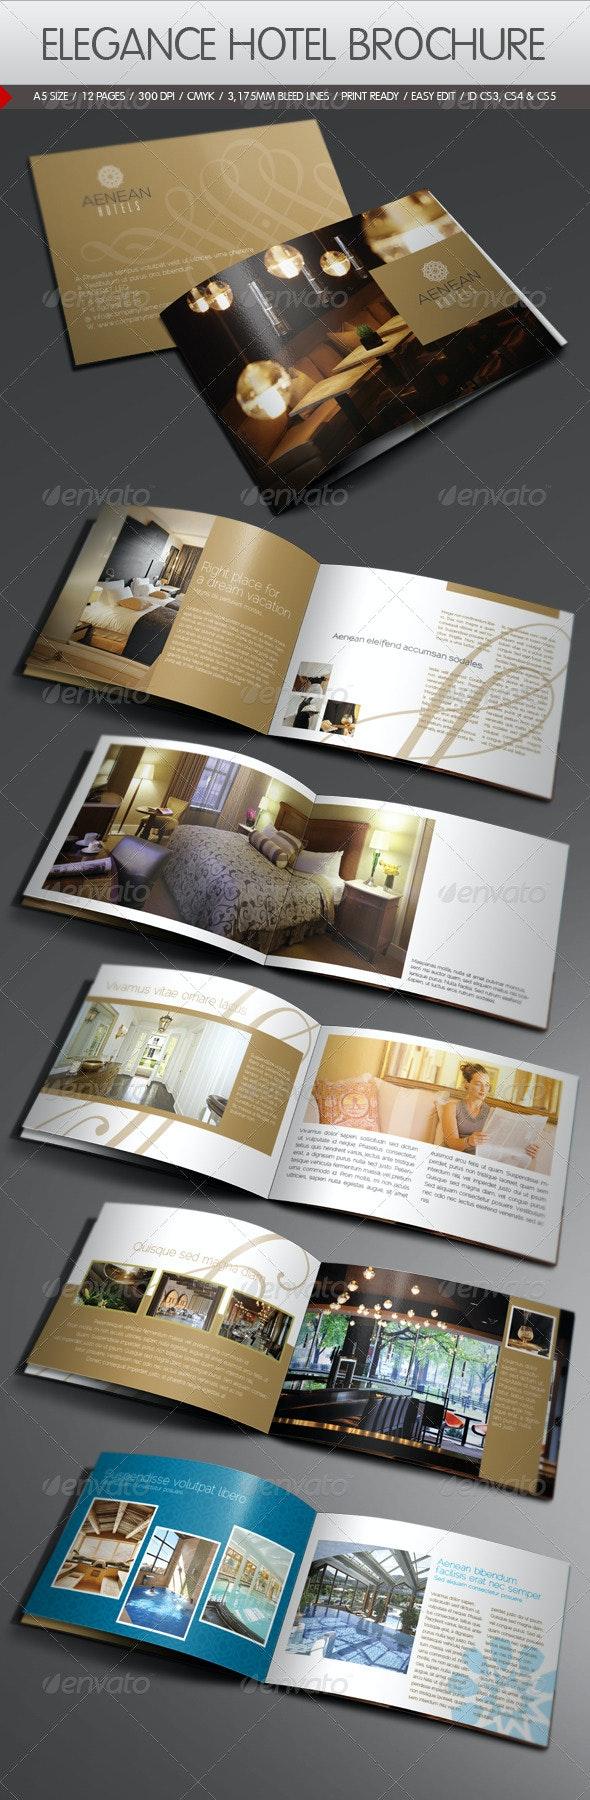 Elegance Hotel Brochure - Corporate Brochures